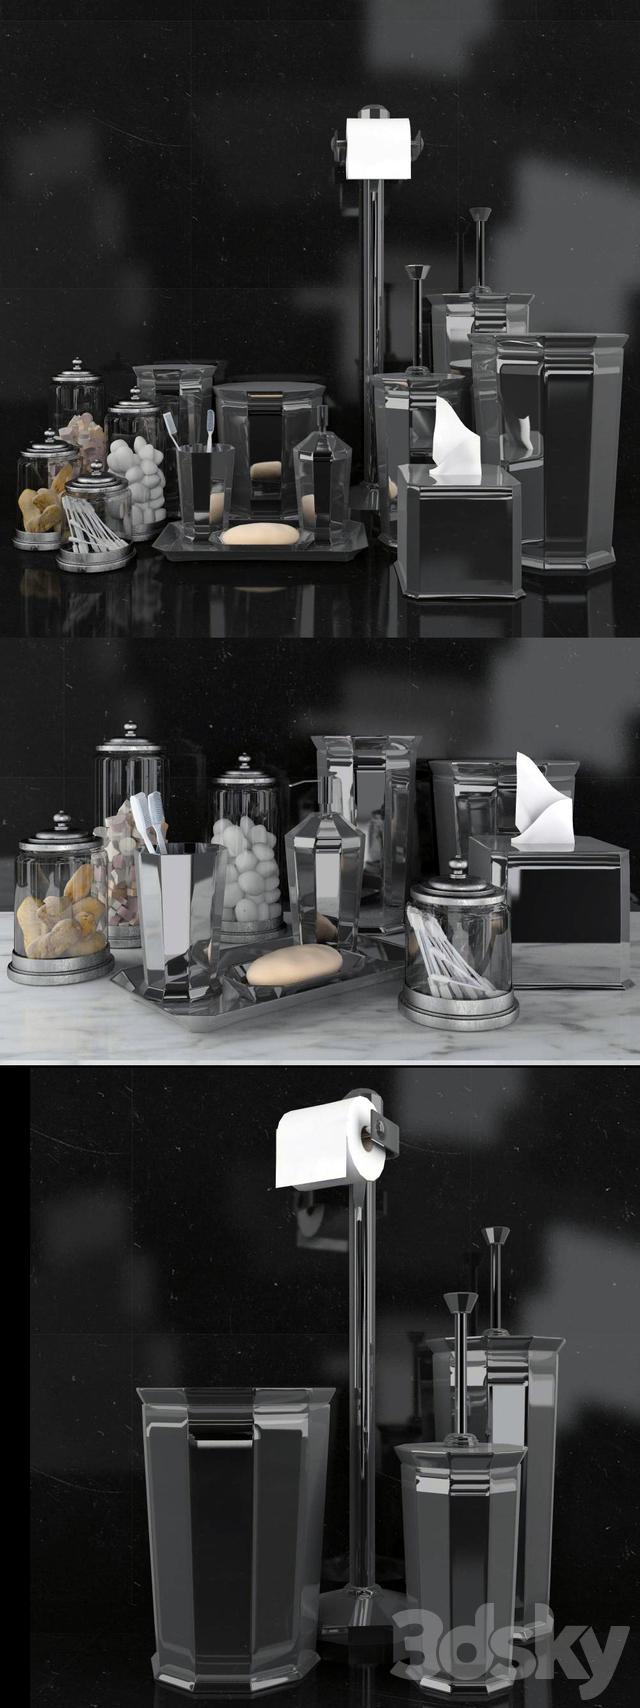 3d Models Bathroom Accessories Rh Faceted Metal Accessories